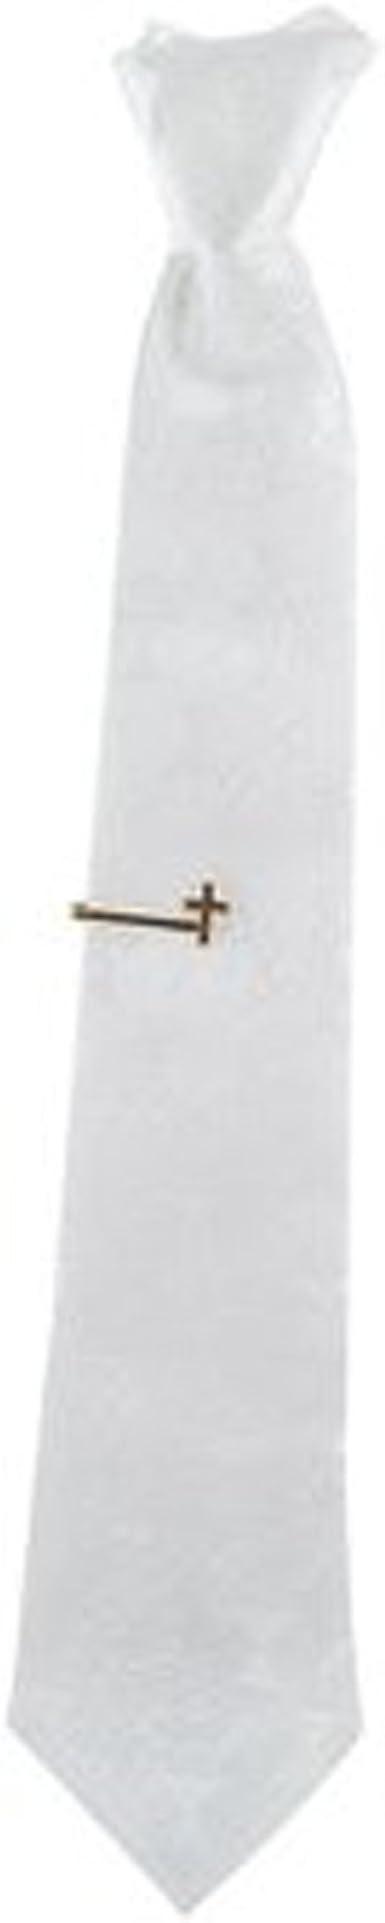 First Communion Boys Tie Set White Neck Tie with Tie Clip